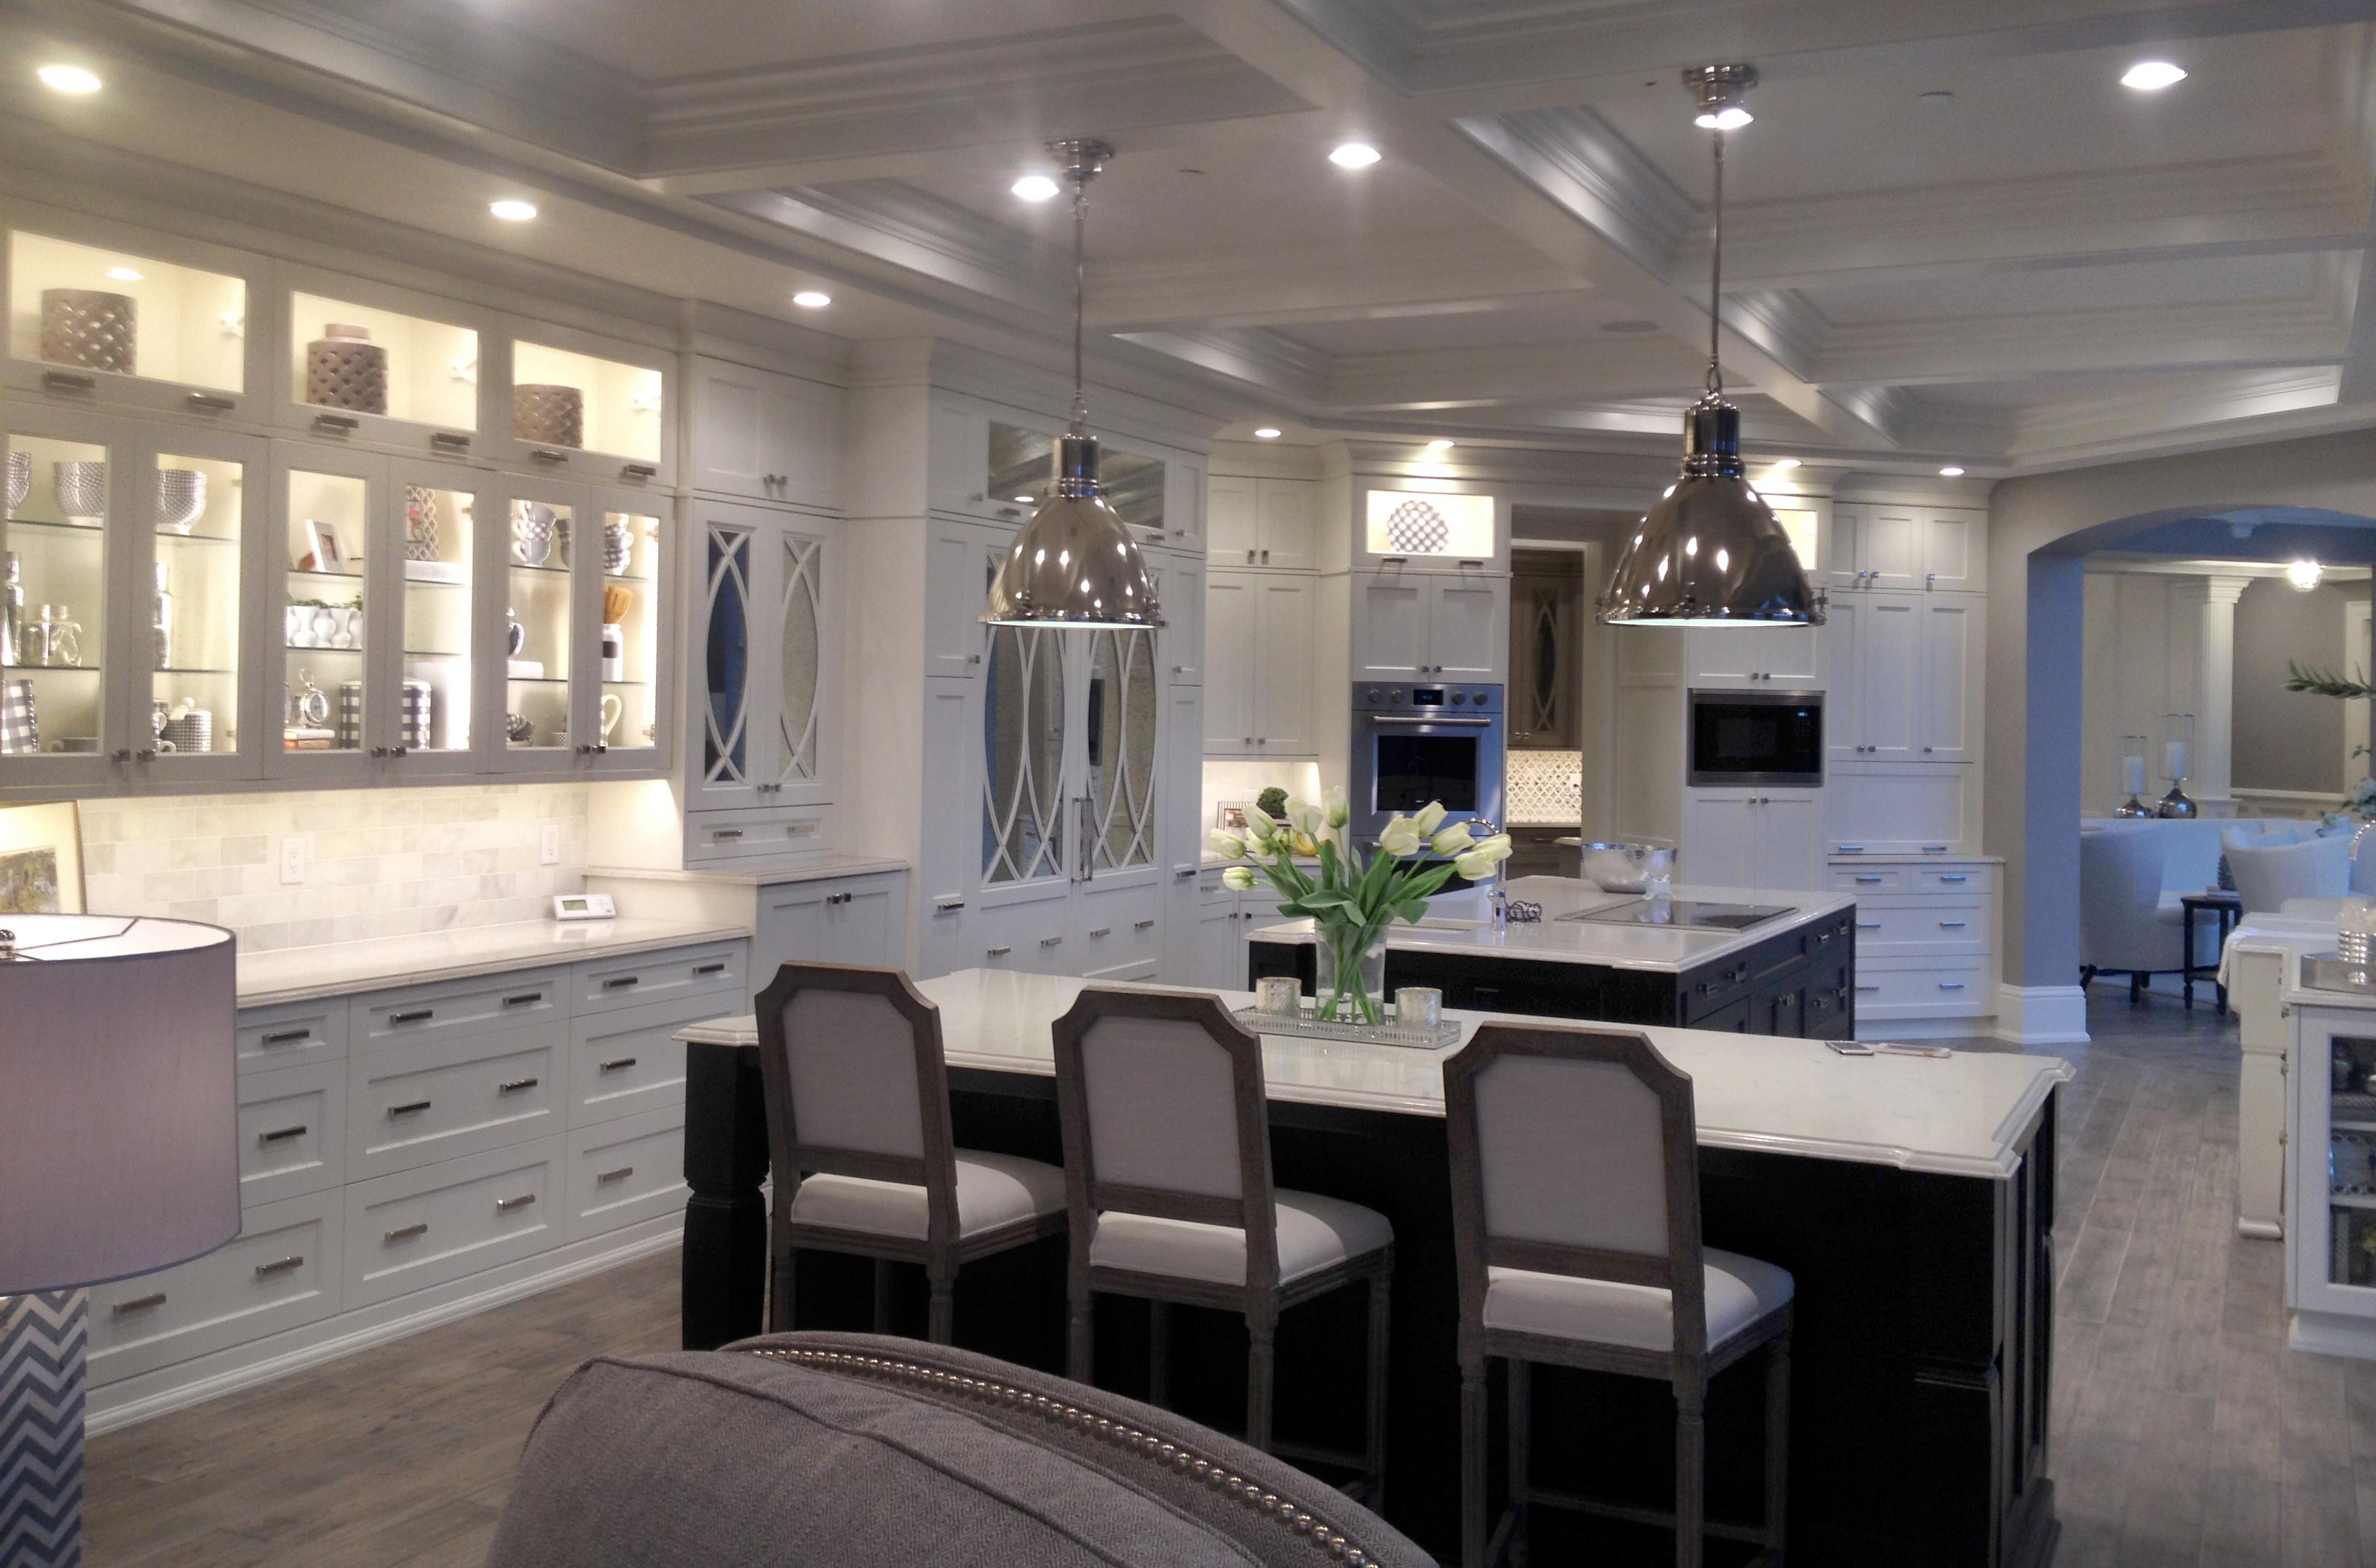 bellagio court kitchen and home remodel kitchen kitchen cabinets and kitchen remodeler in des moines iowa